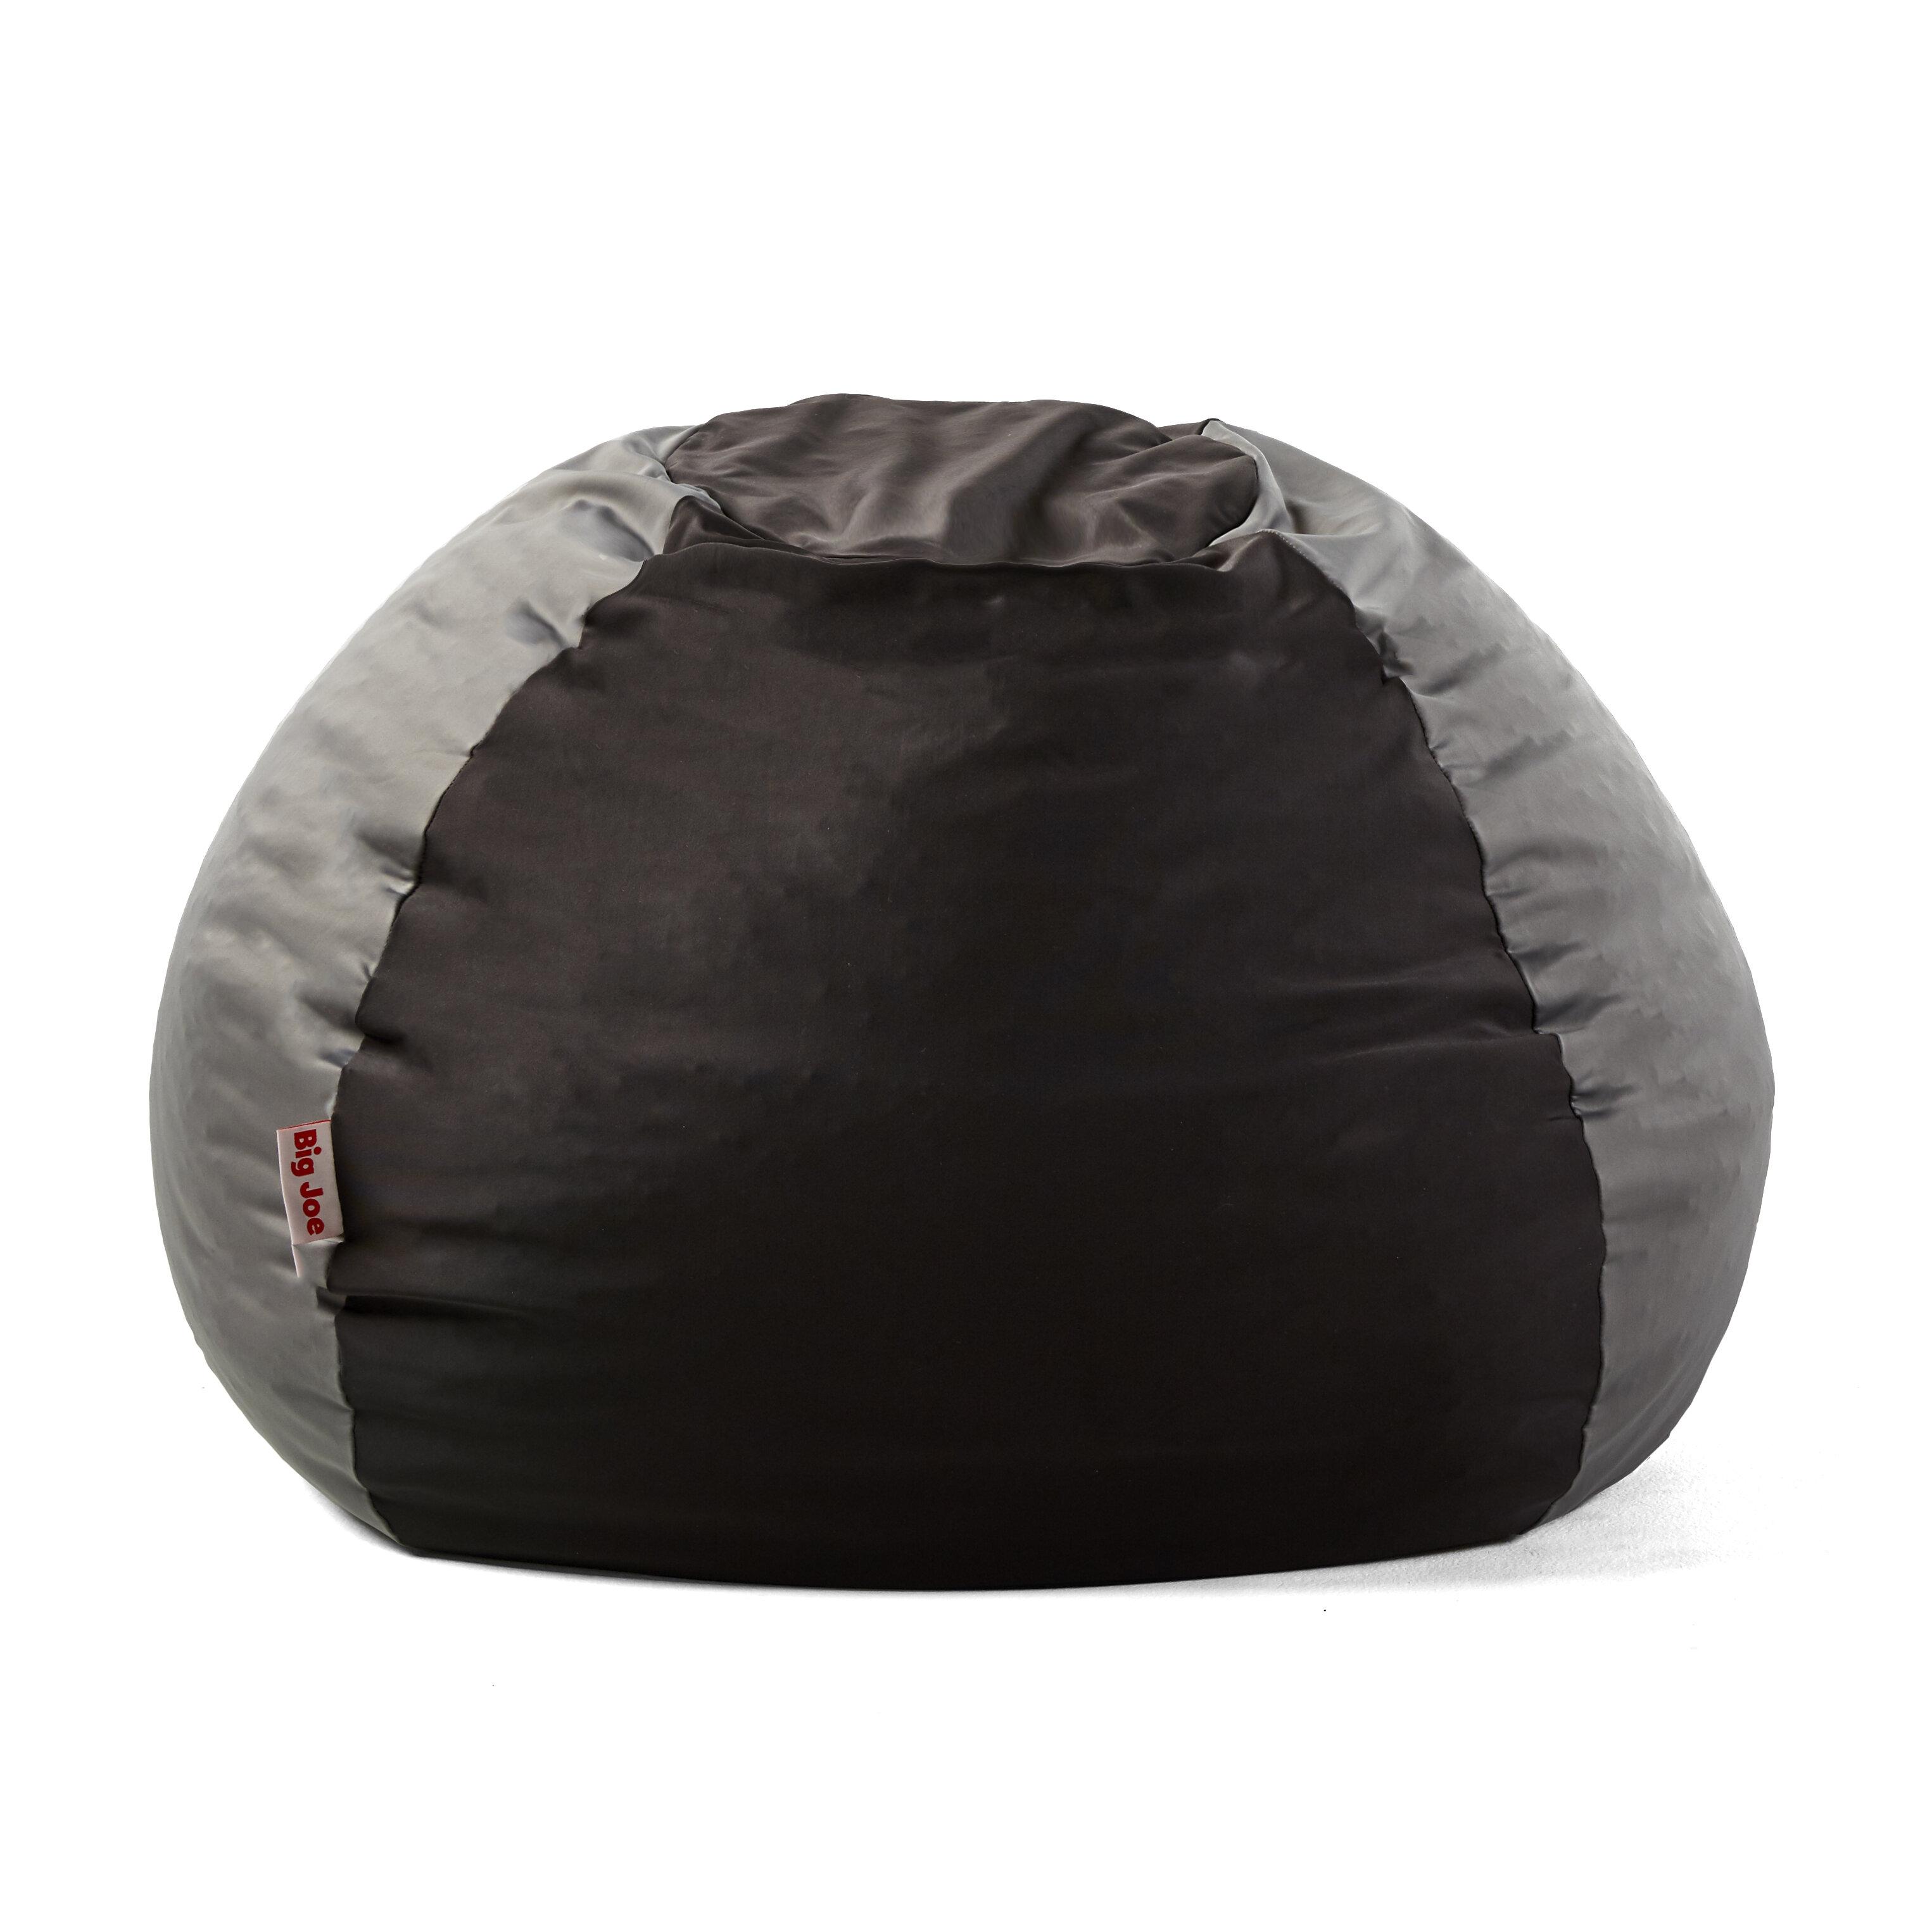 Comfort Research Big Joe Kushi Bean Bag Chair | Wayfair